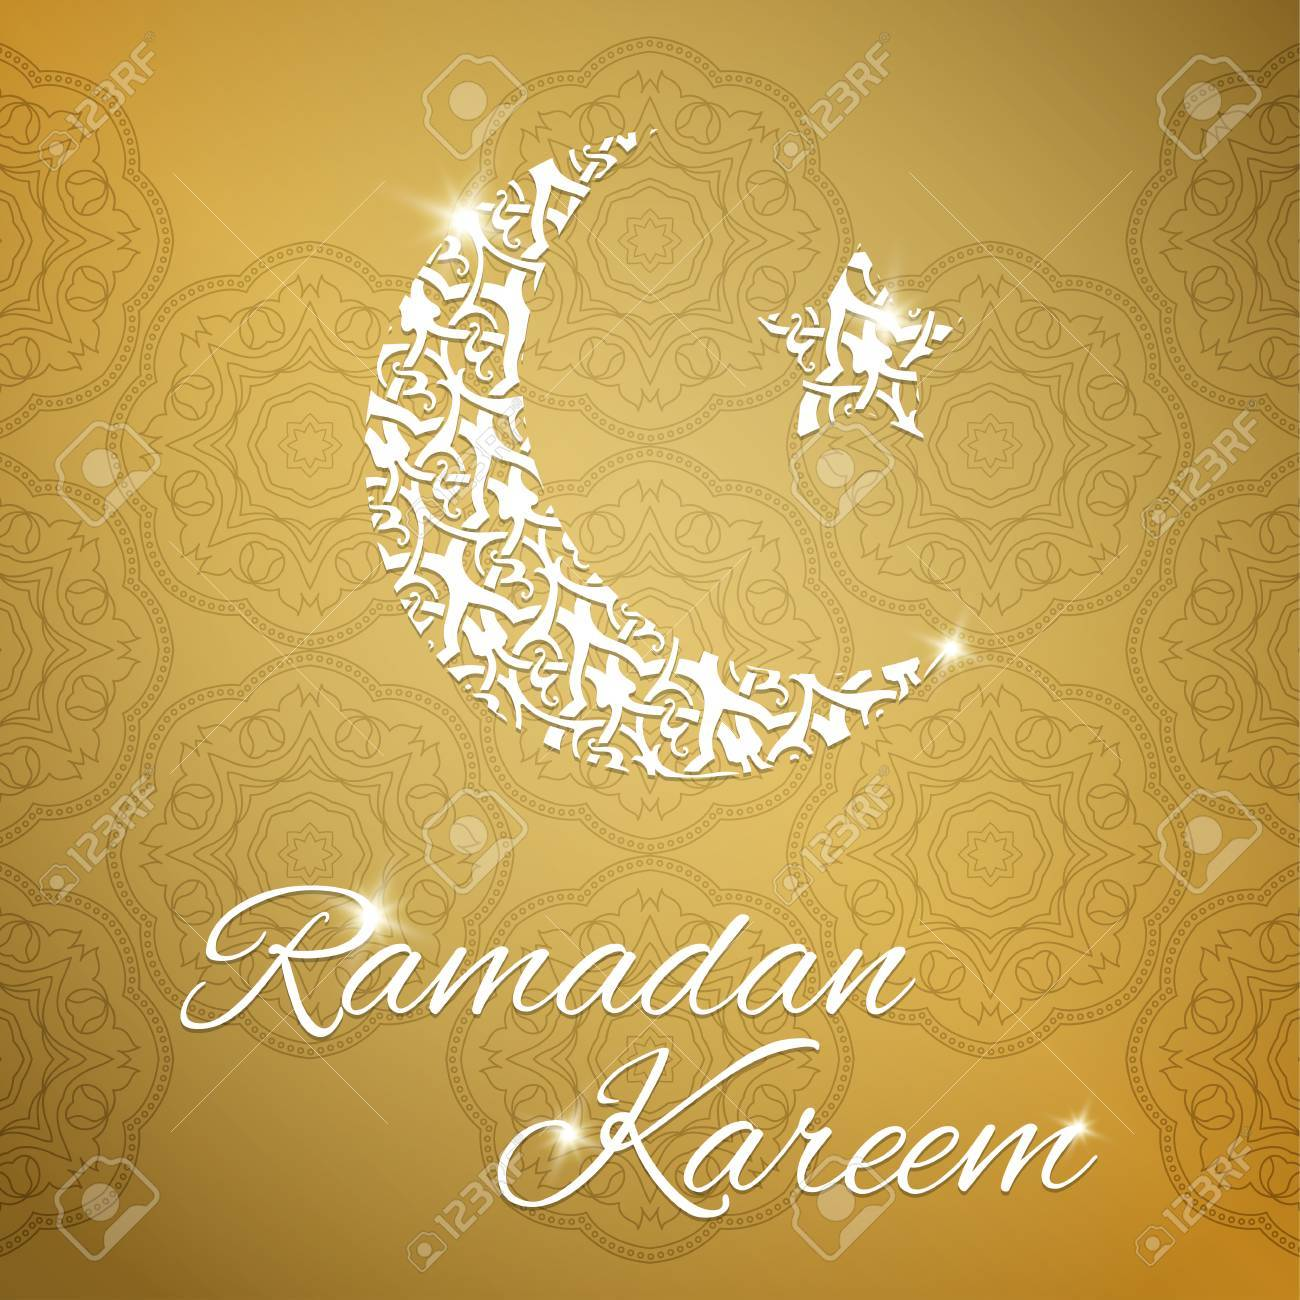 Ramadan kareem greeting card with half moon and star gold color ramadan kareem greeting card with half moon and star gold color vector illustration stock vector m4hsunfo